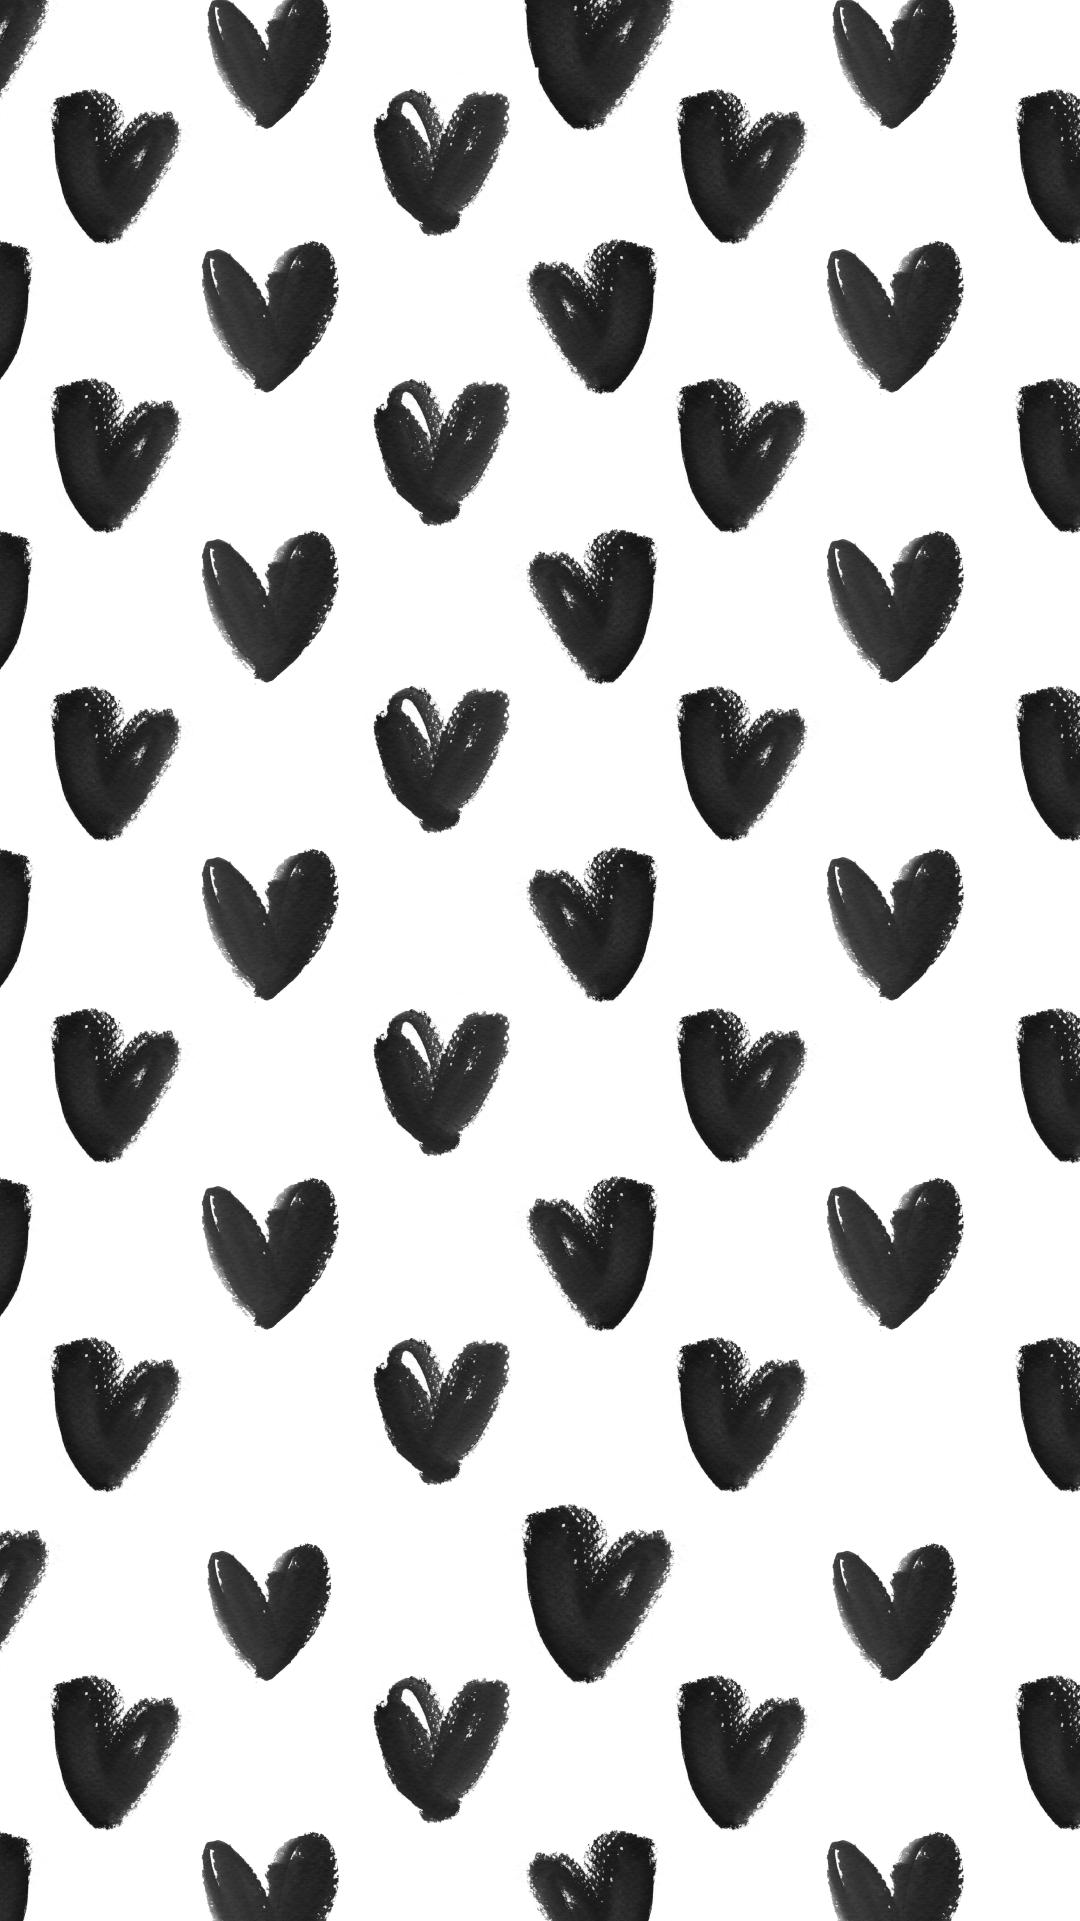 Black White Watercolour Hearts Iphone Background Wallpaper Phone Lock Screen Iphone Arkaplanlari Arkaplan Tasarimlari Poster Tasarimlari